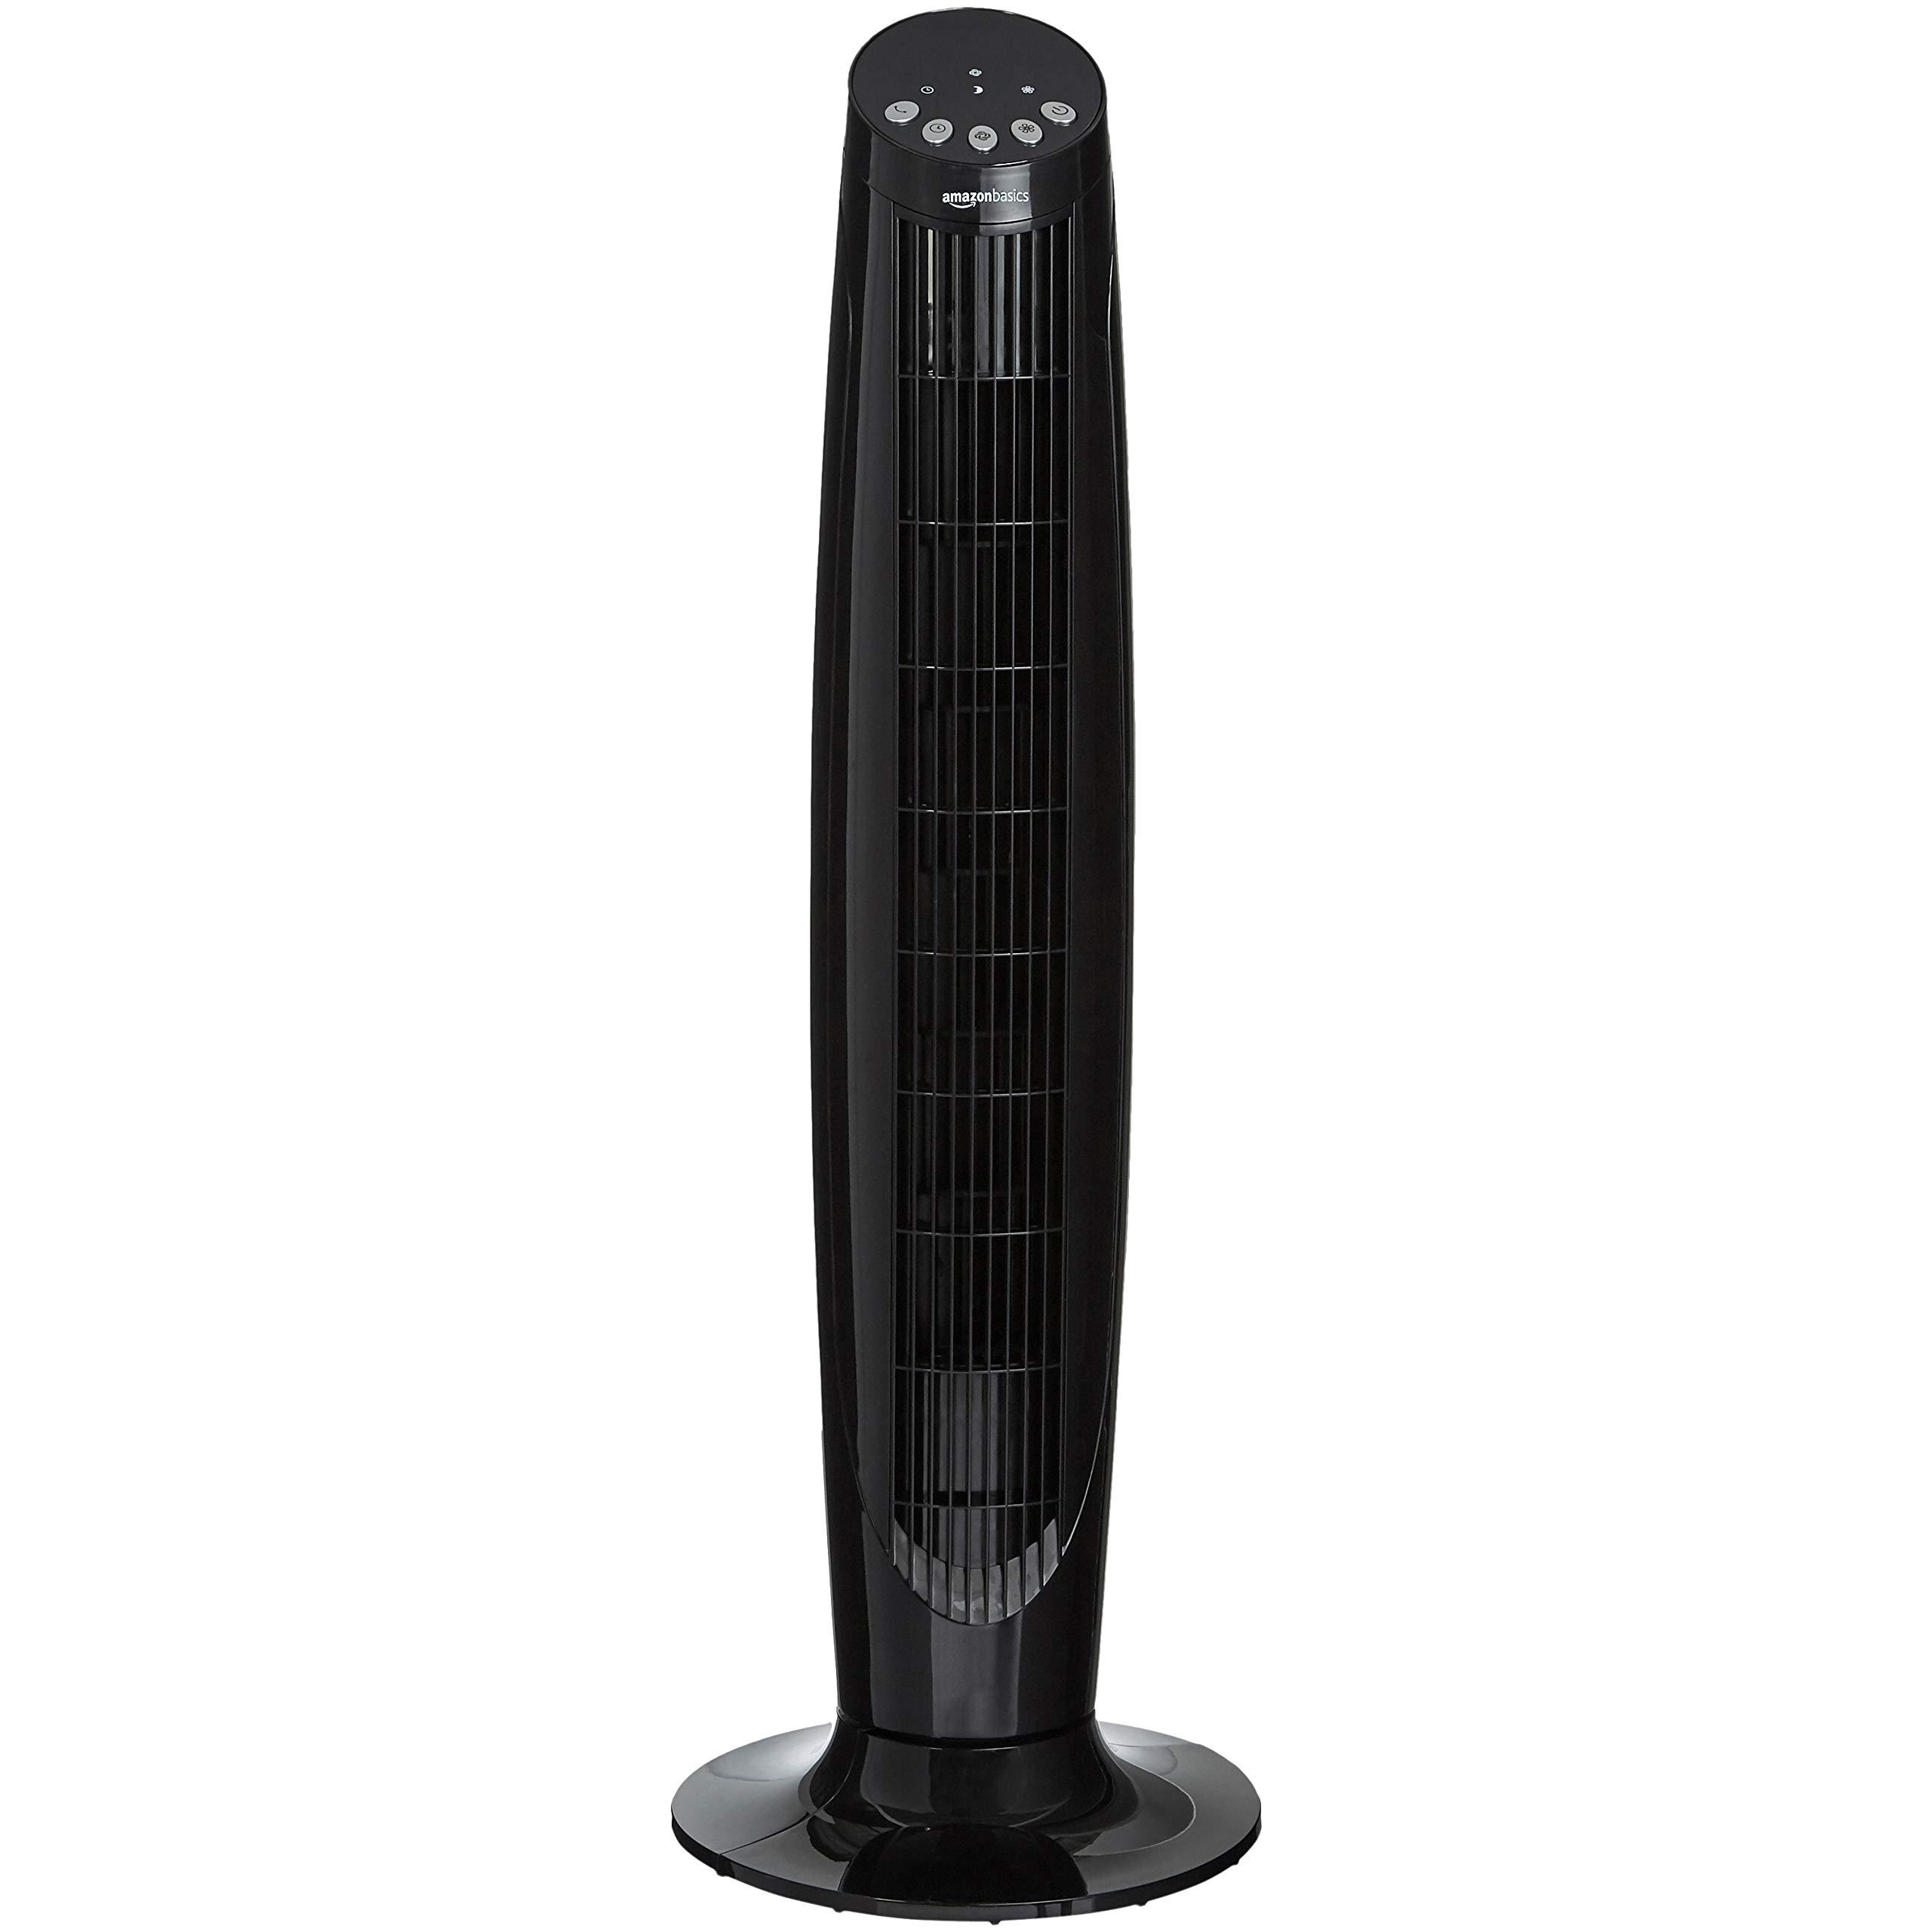 AmazonBasics Digital Oscillating 3 Speed Tower Fan with Remote by AmazonBasics